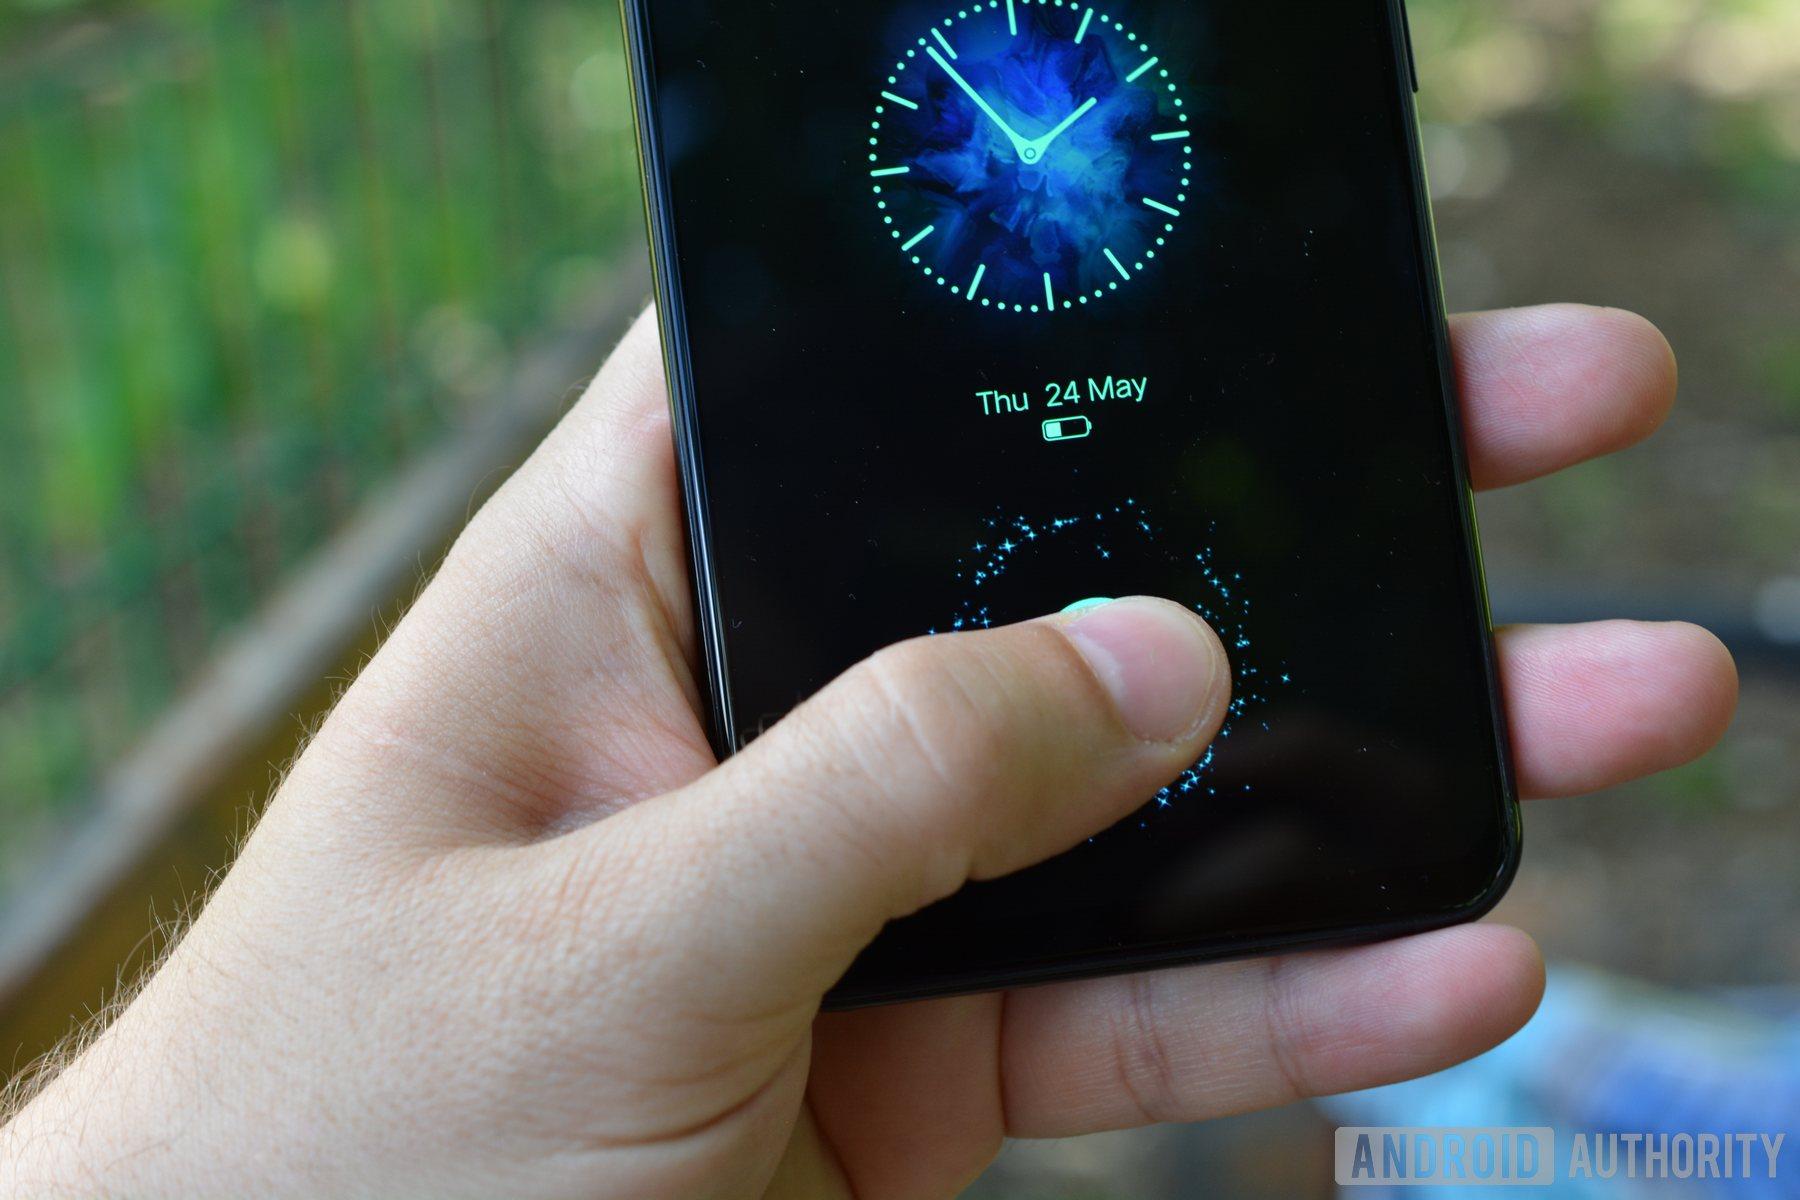 Using the fingerprint sensor on the Vivo X21 UD